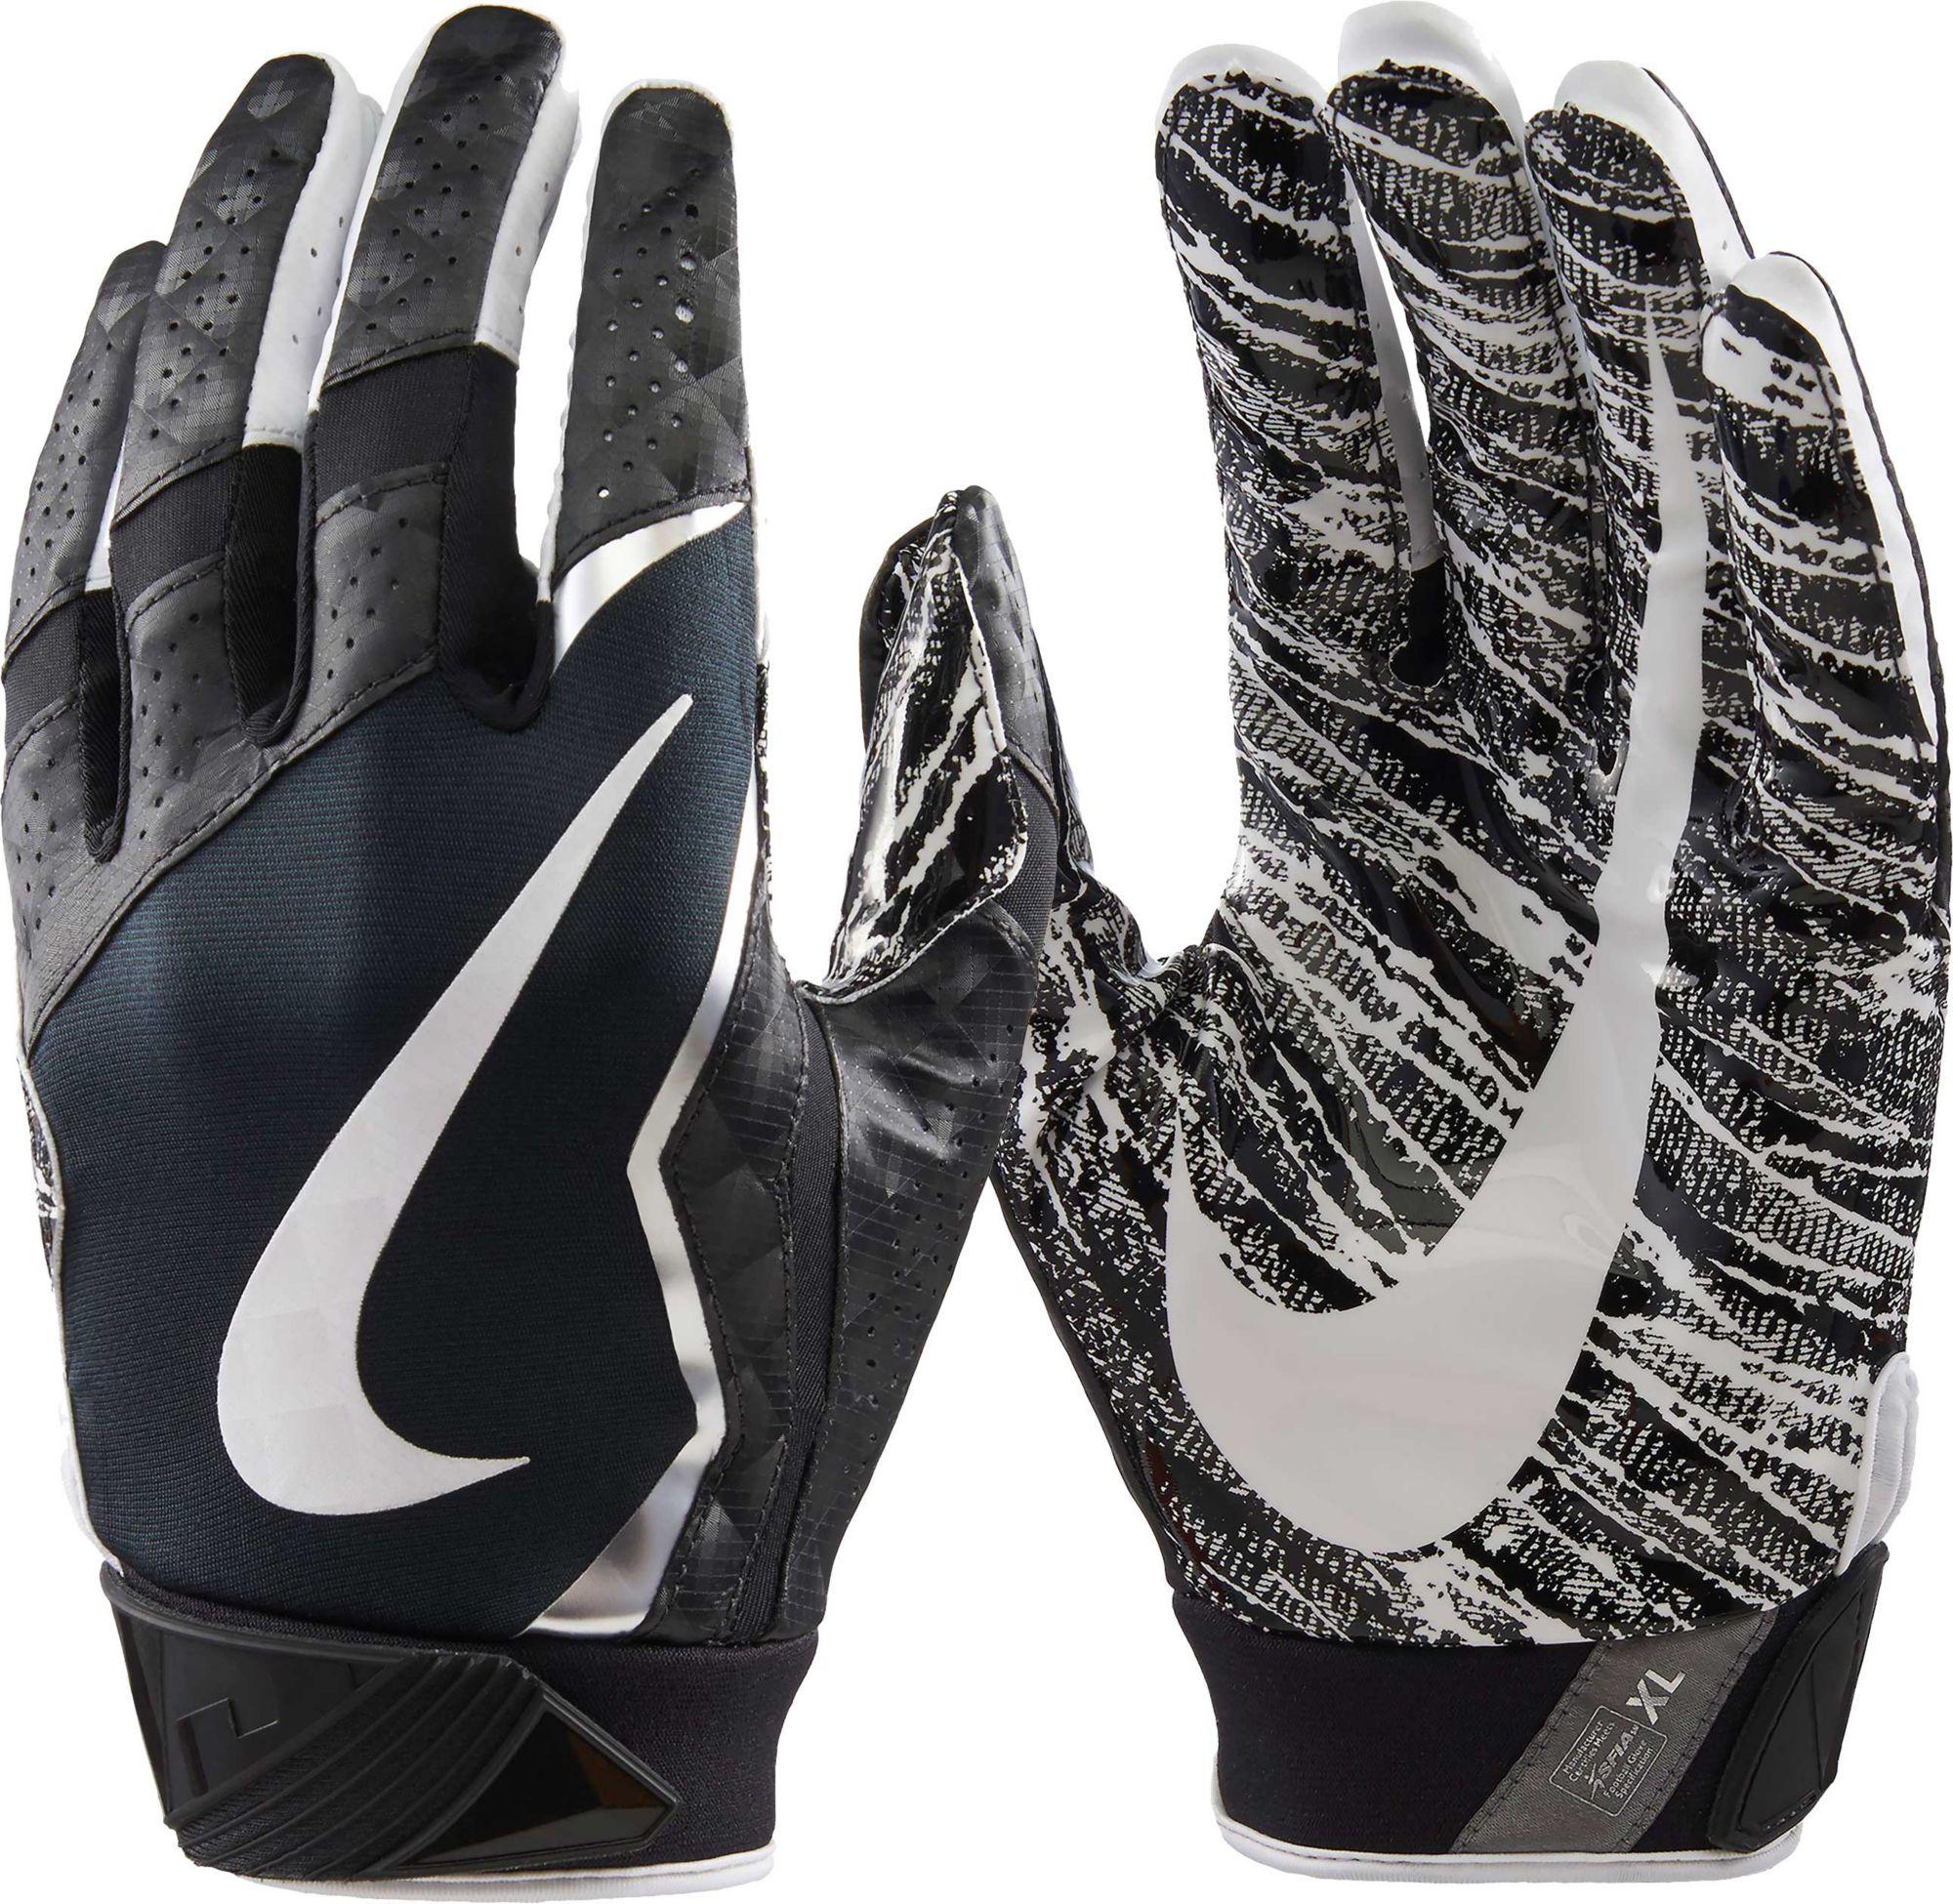 Nike Football Gloves Youth Size Chart: Nike Football Gloves